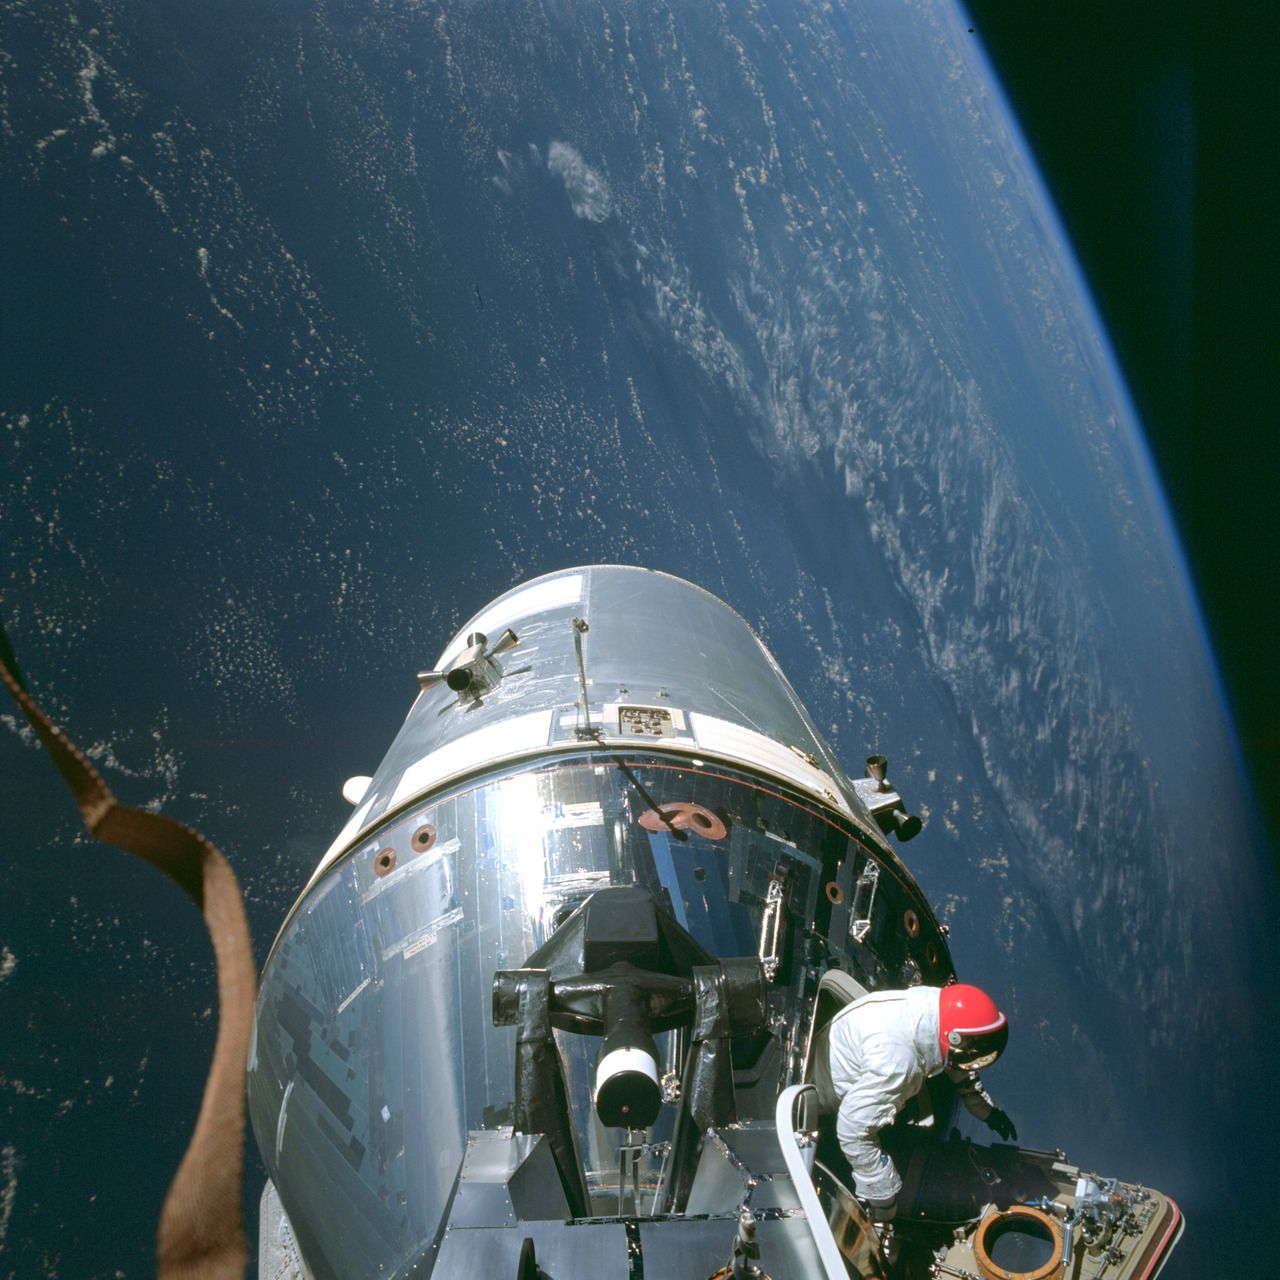 apollo space program nasa - photo #45